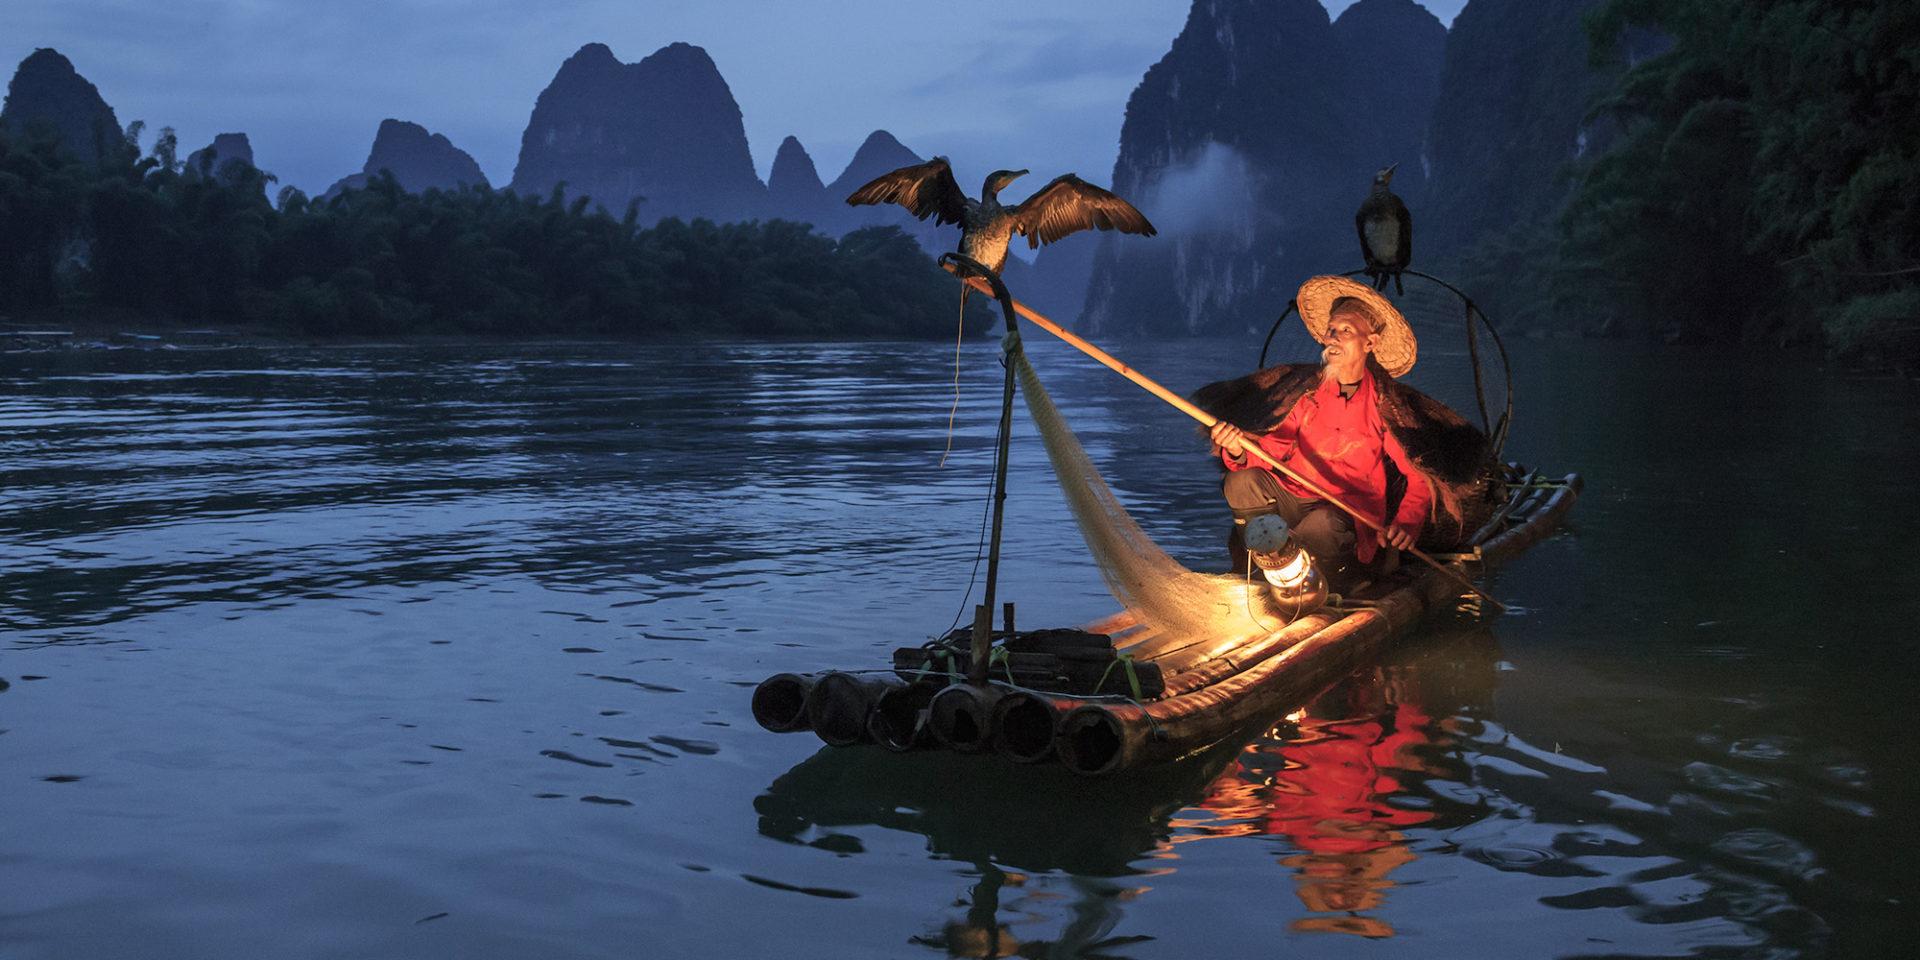 Cormorant Fisherman #2